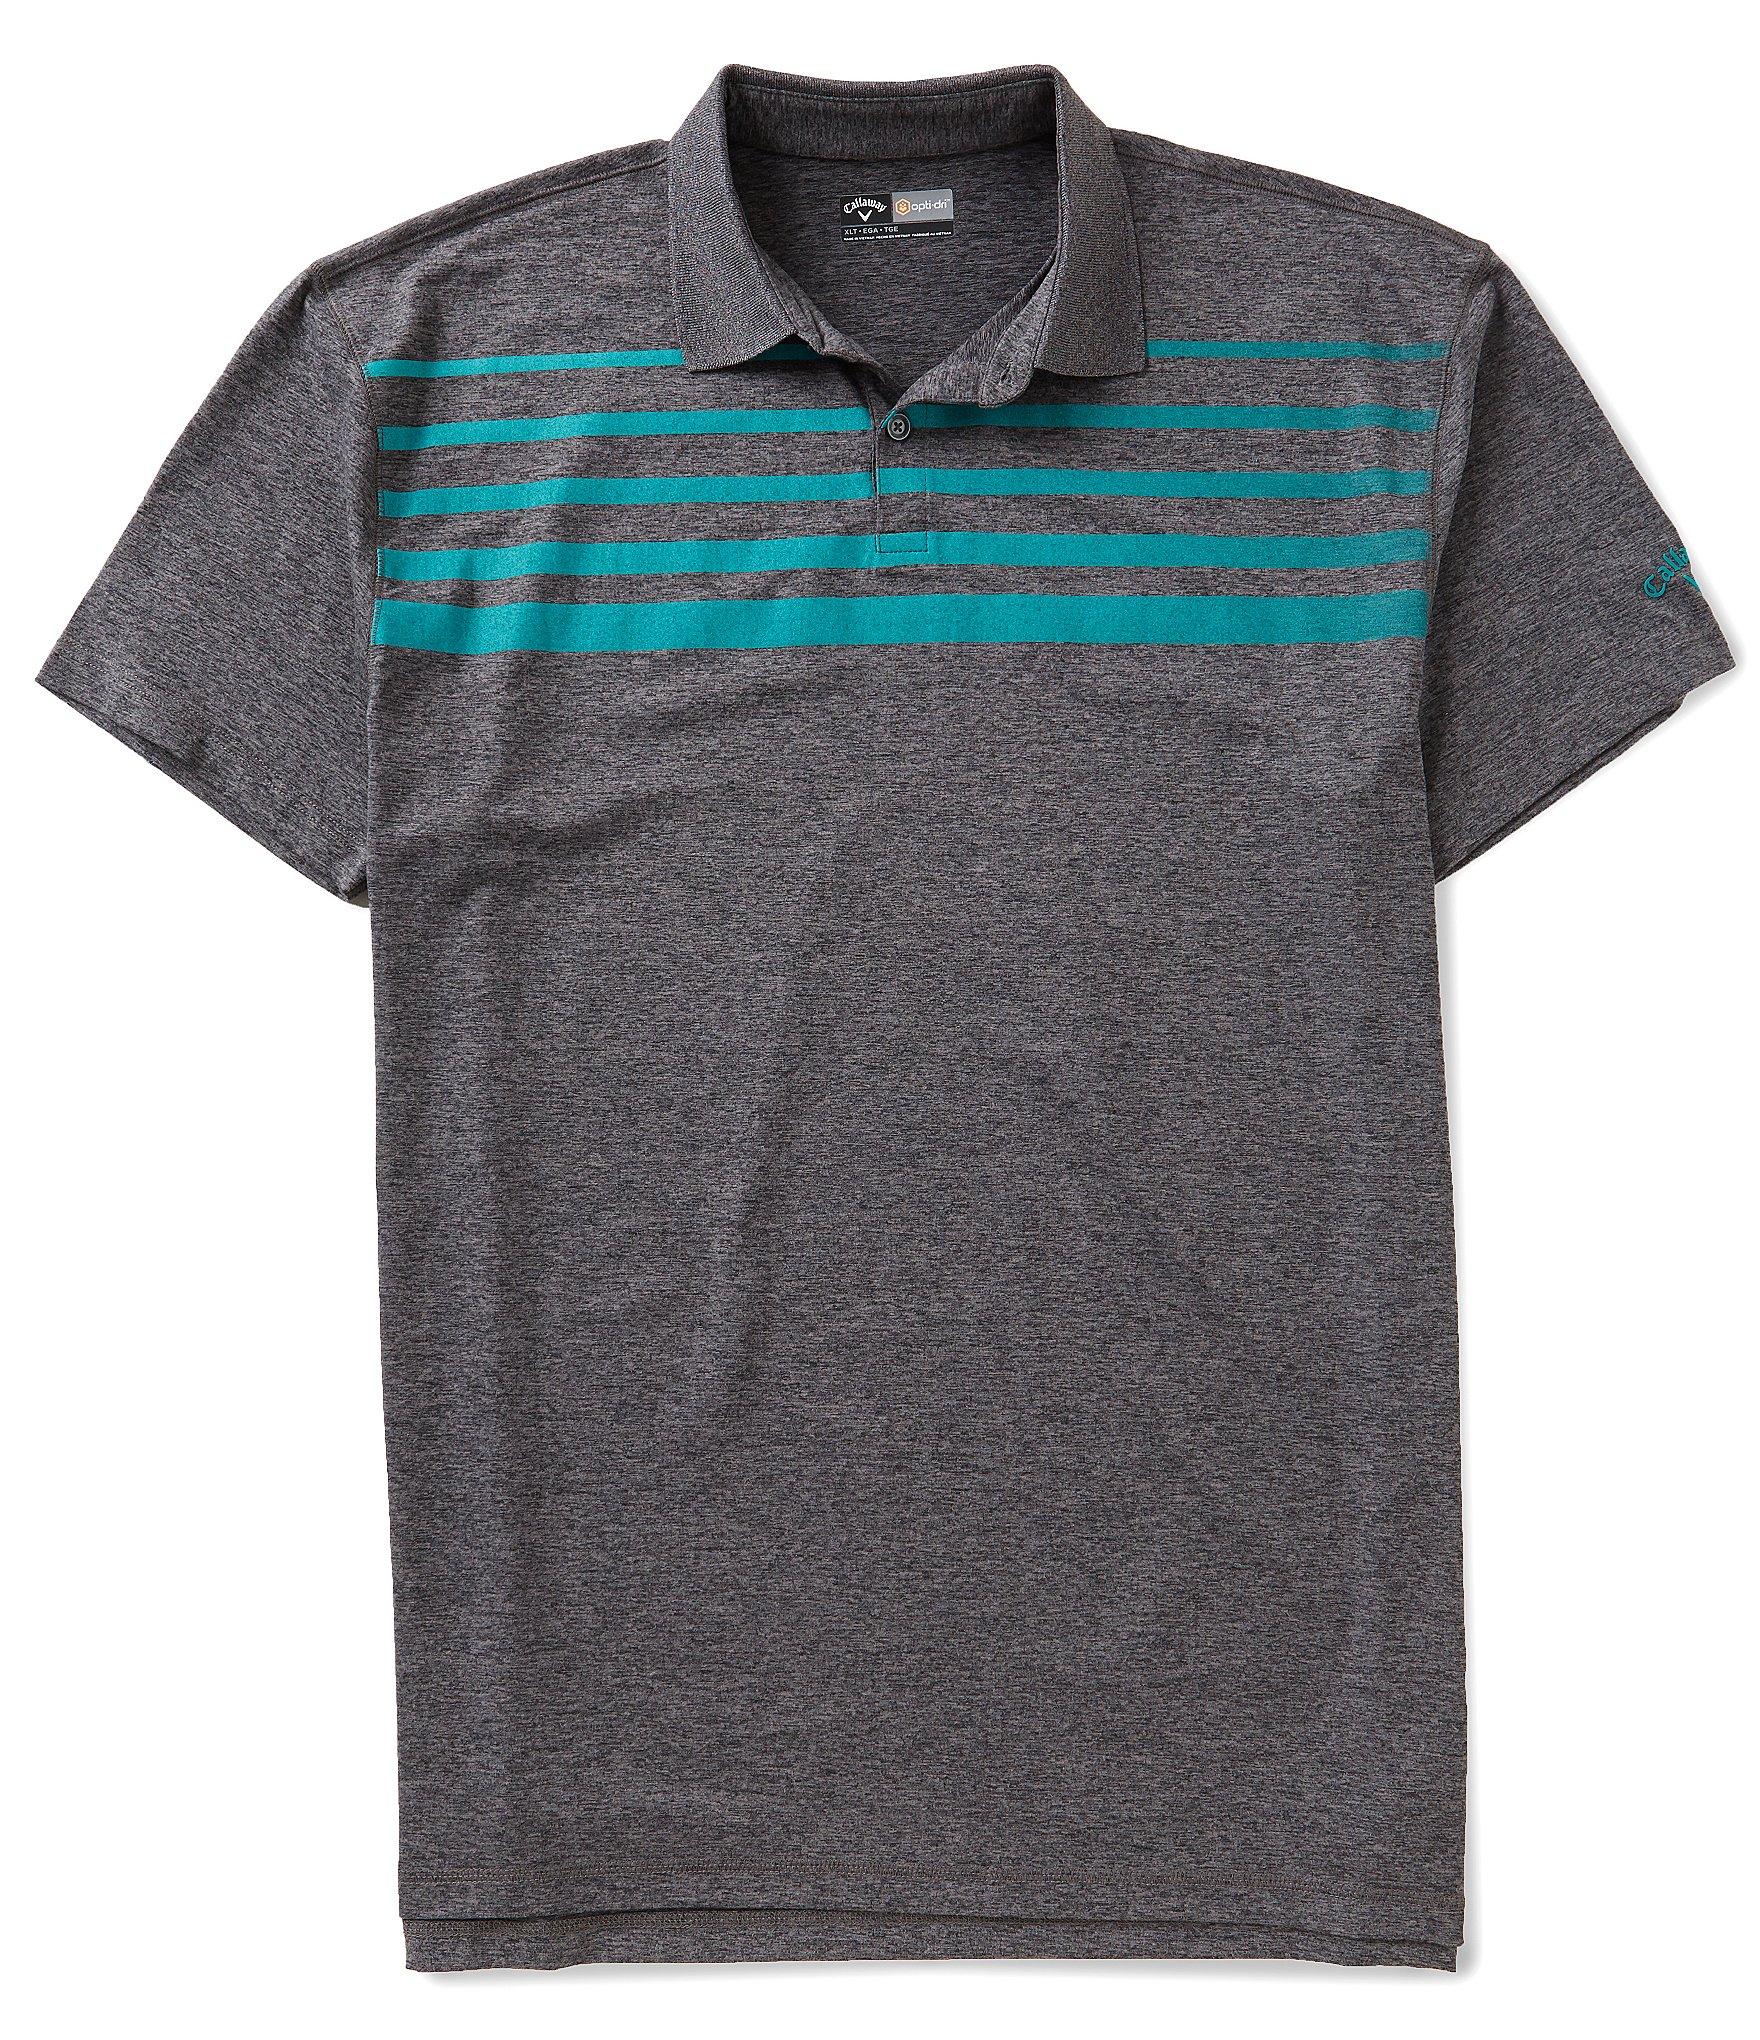 Callaway golf big tall faded stripe polo shirt dillards for Large tall golf shirts